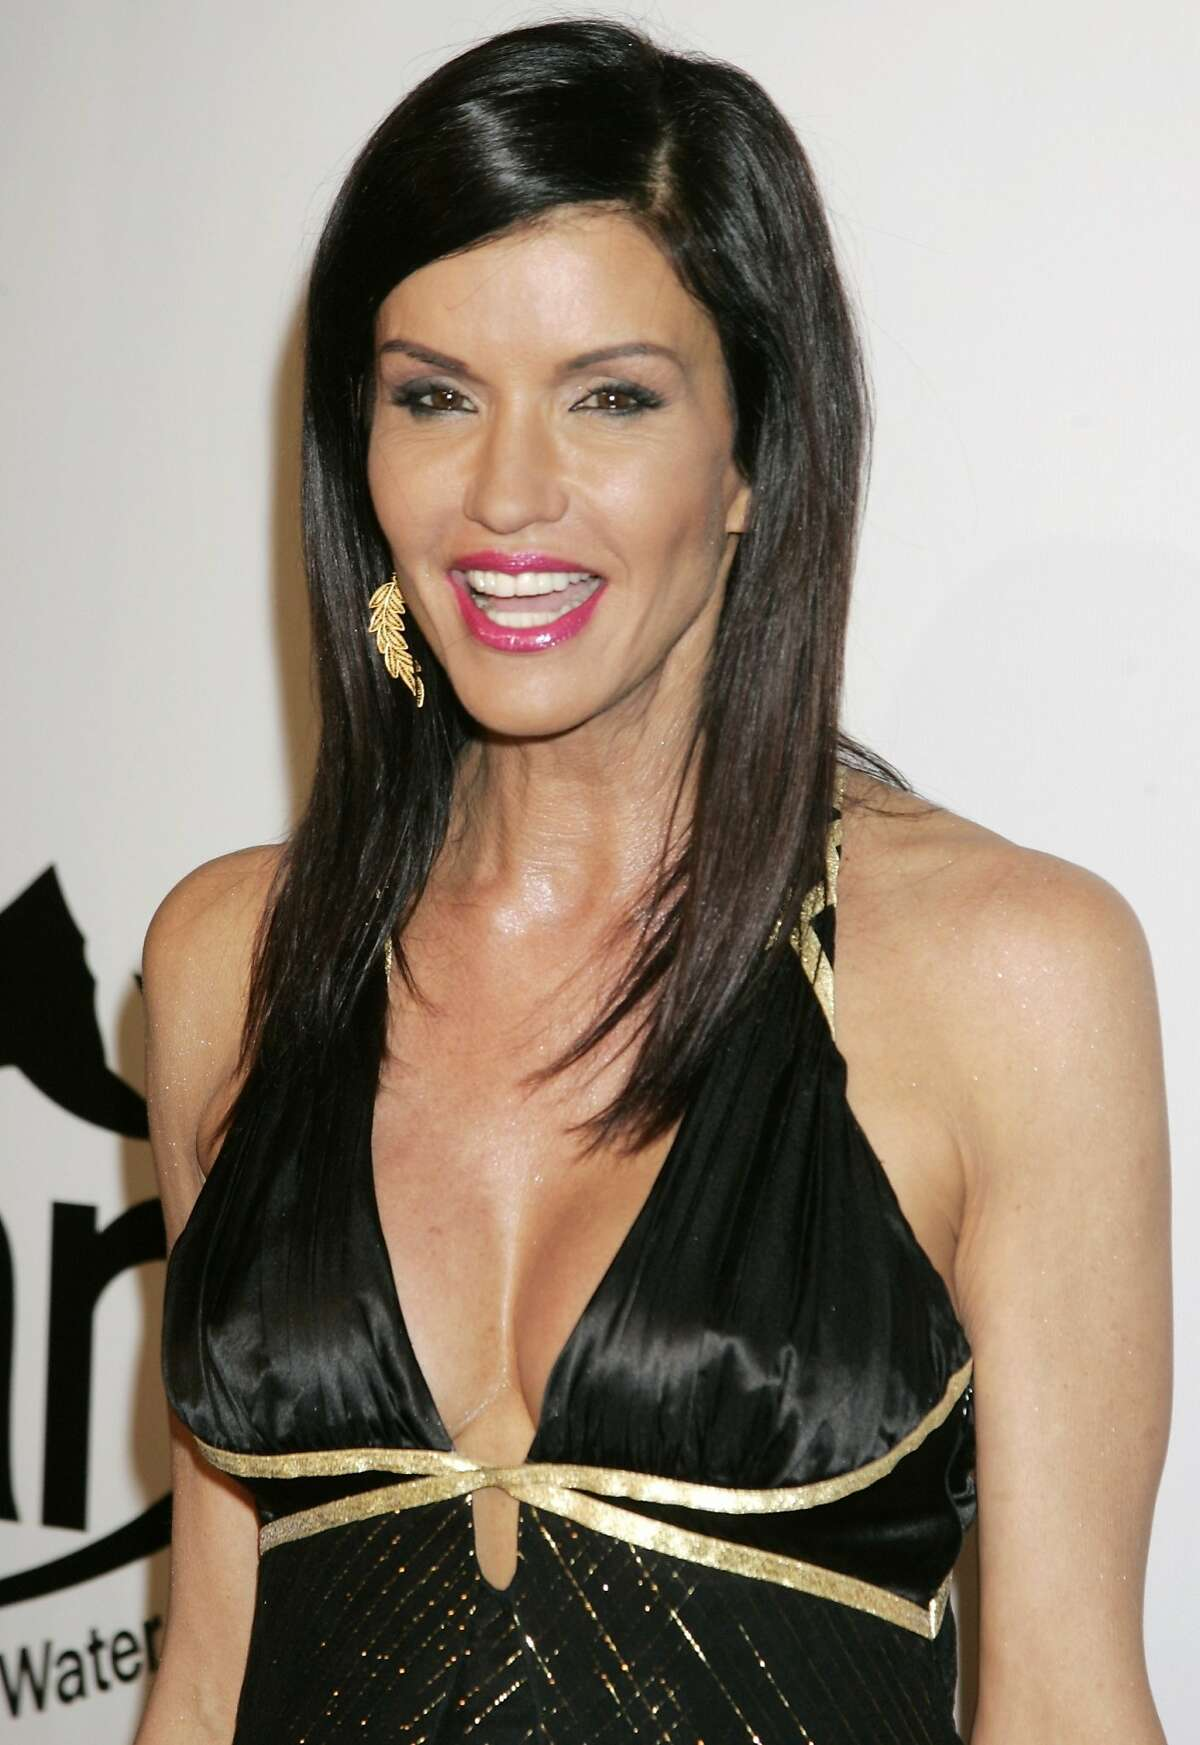 Model Janice Dickinson Born February 15, 1955